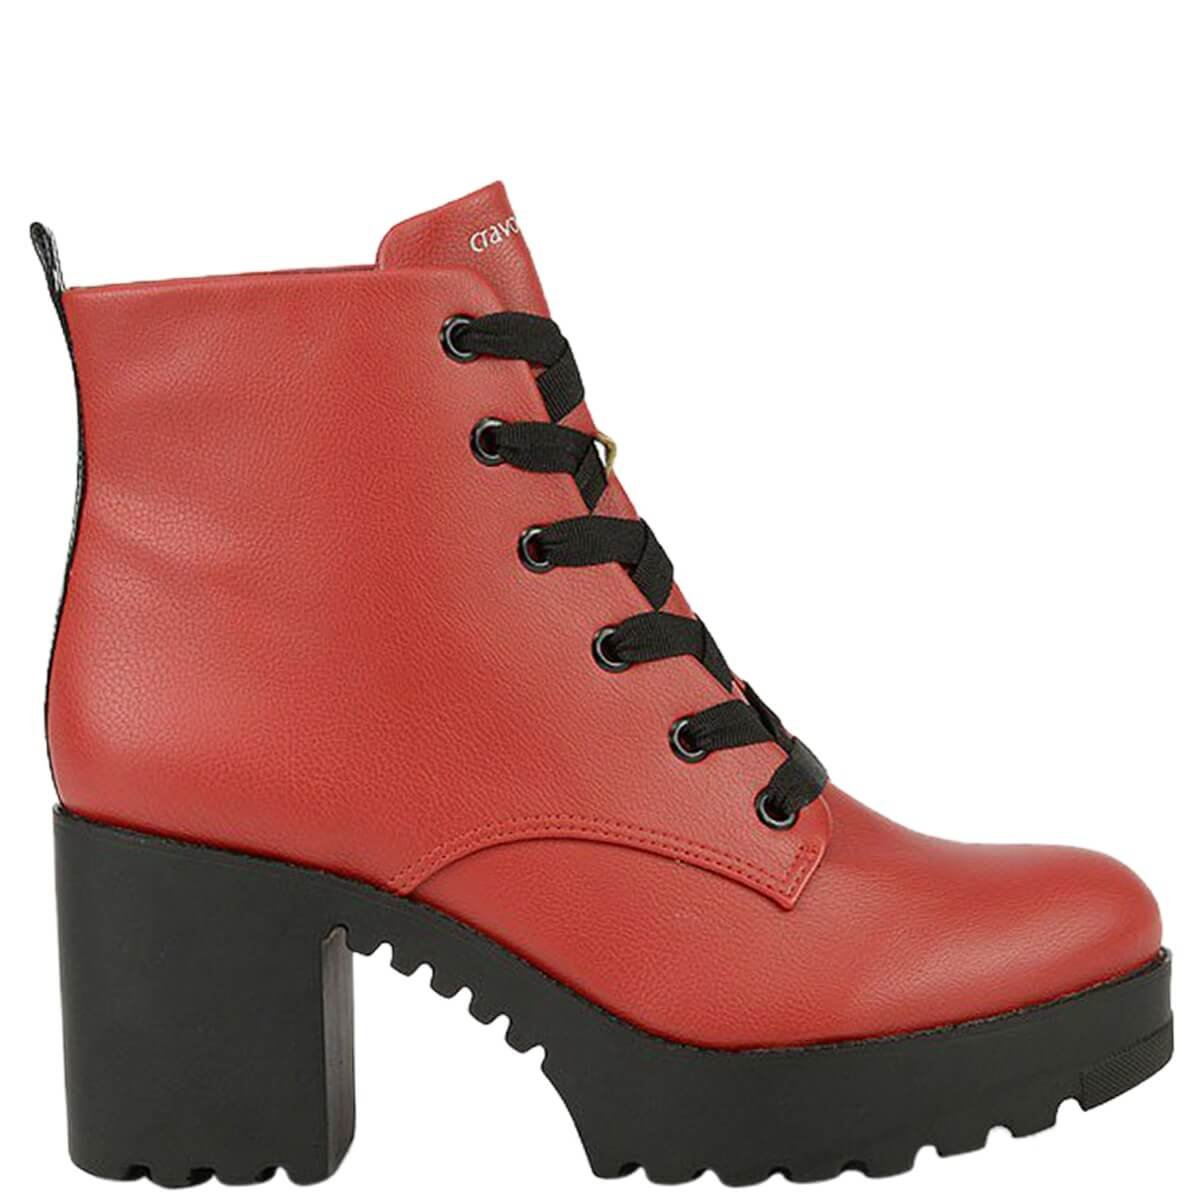 8a2d2f740 Bizz Store - Coturno Feminino Cravo e Canela New Pele Scarlet